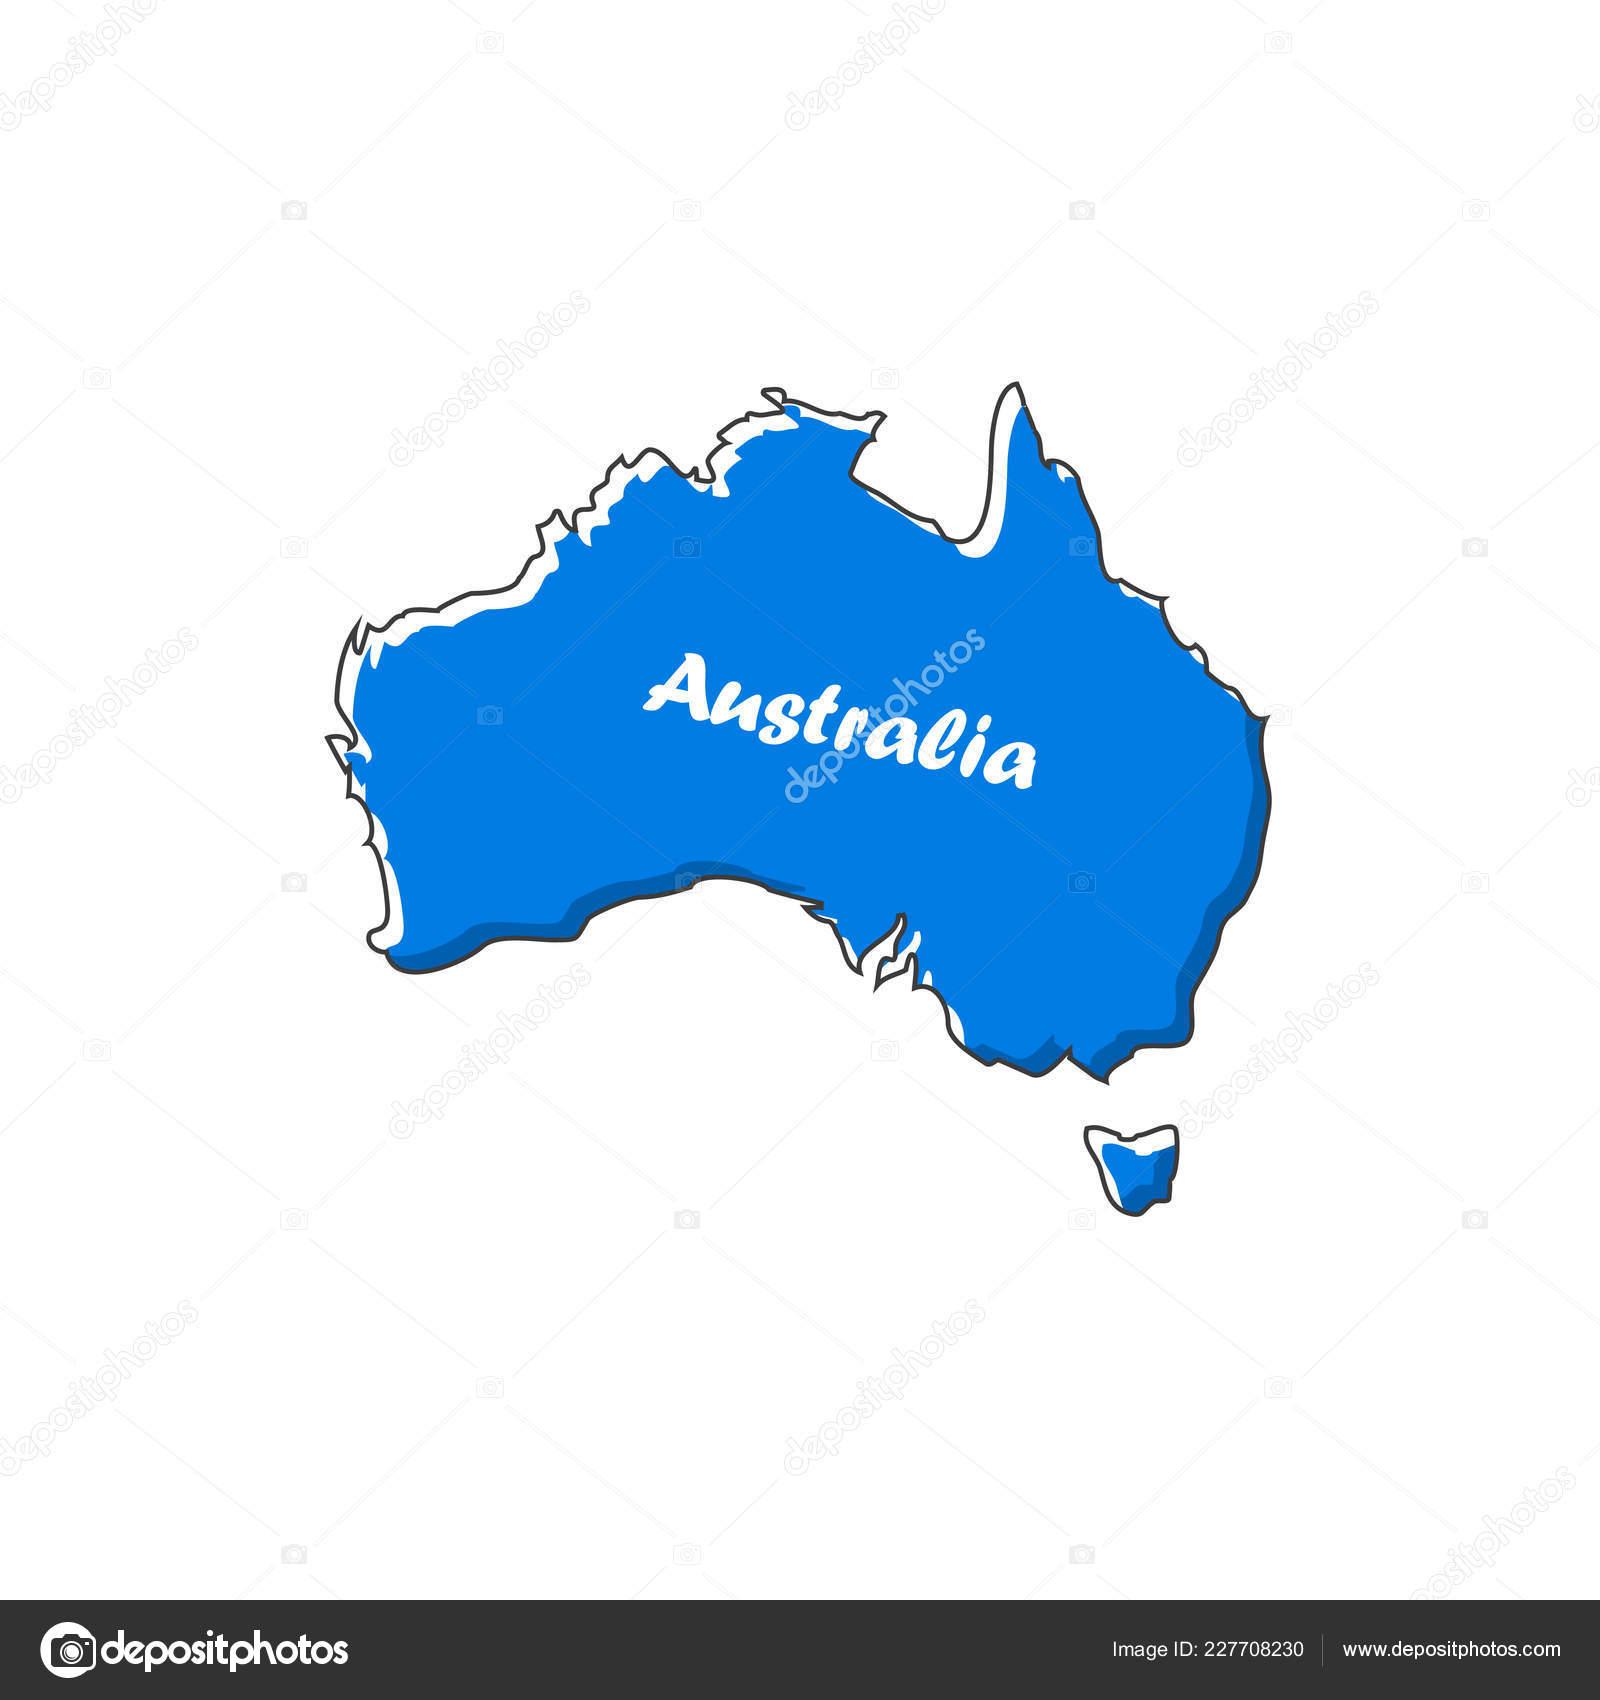 Australia Map Icon.Australia Map Icon Flat Design Vector Illustration Stock Vector